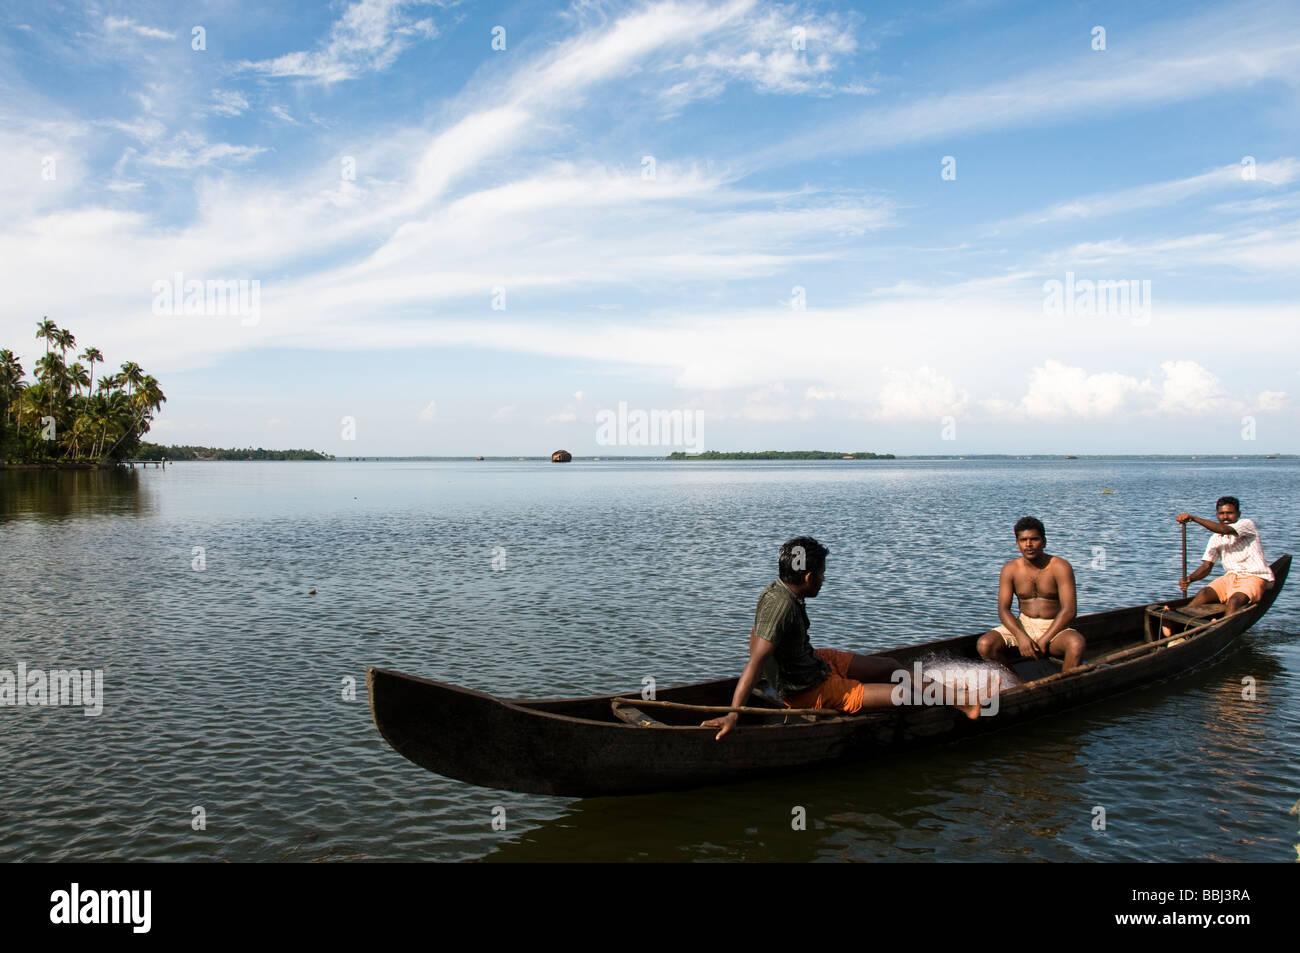 Fisherman fishing in rowing boat fishing on lake, backwaters kerala, India - Stock Image